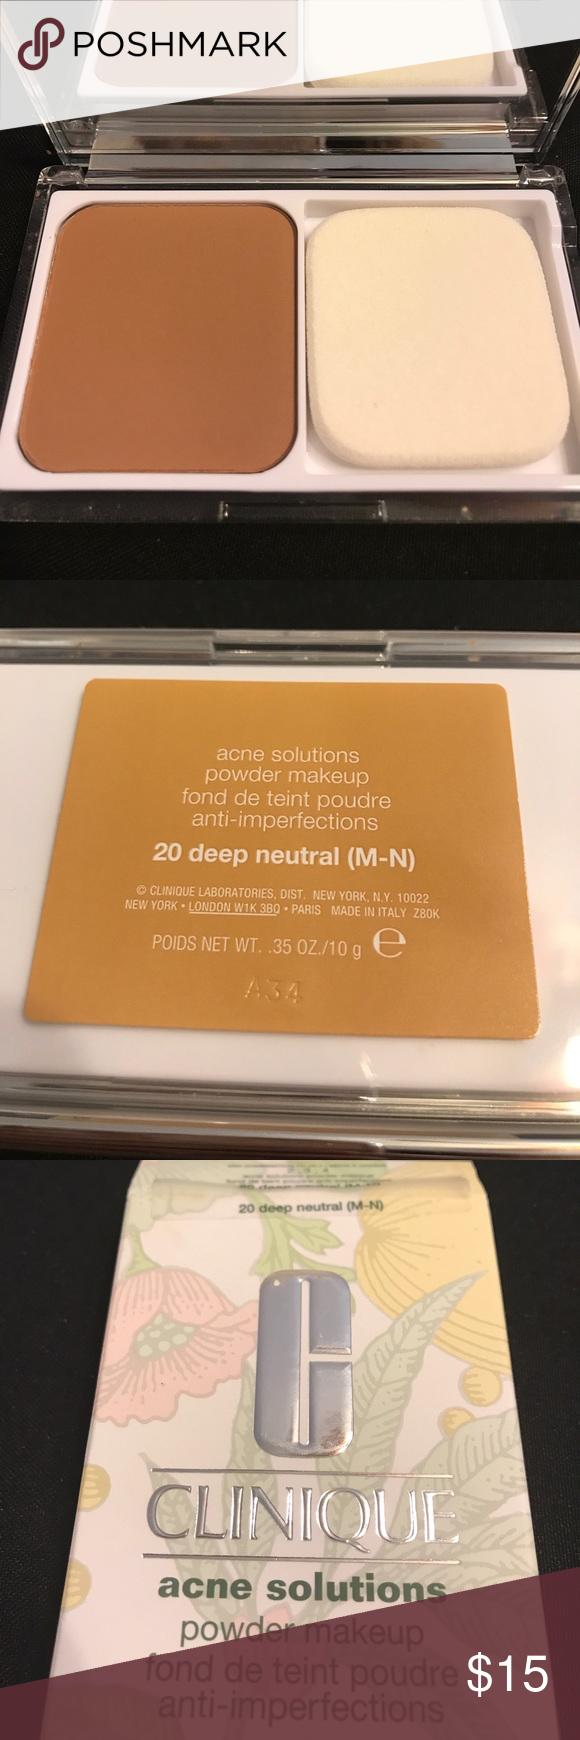 Clinique 20 Acne Solutions Powder. New Deep MN Clinique